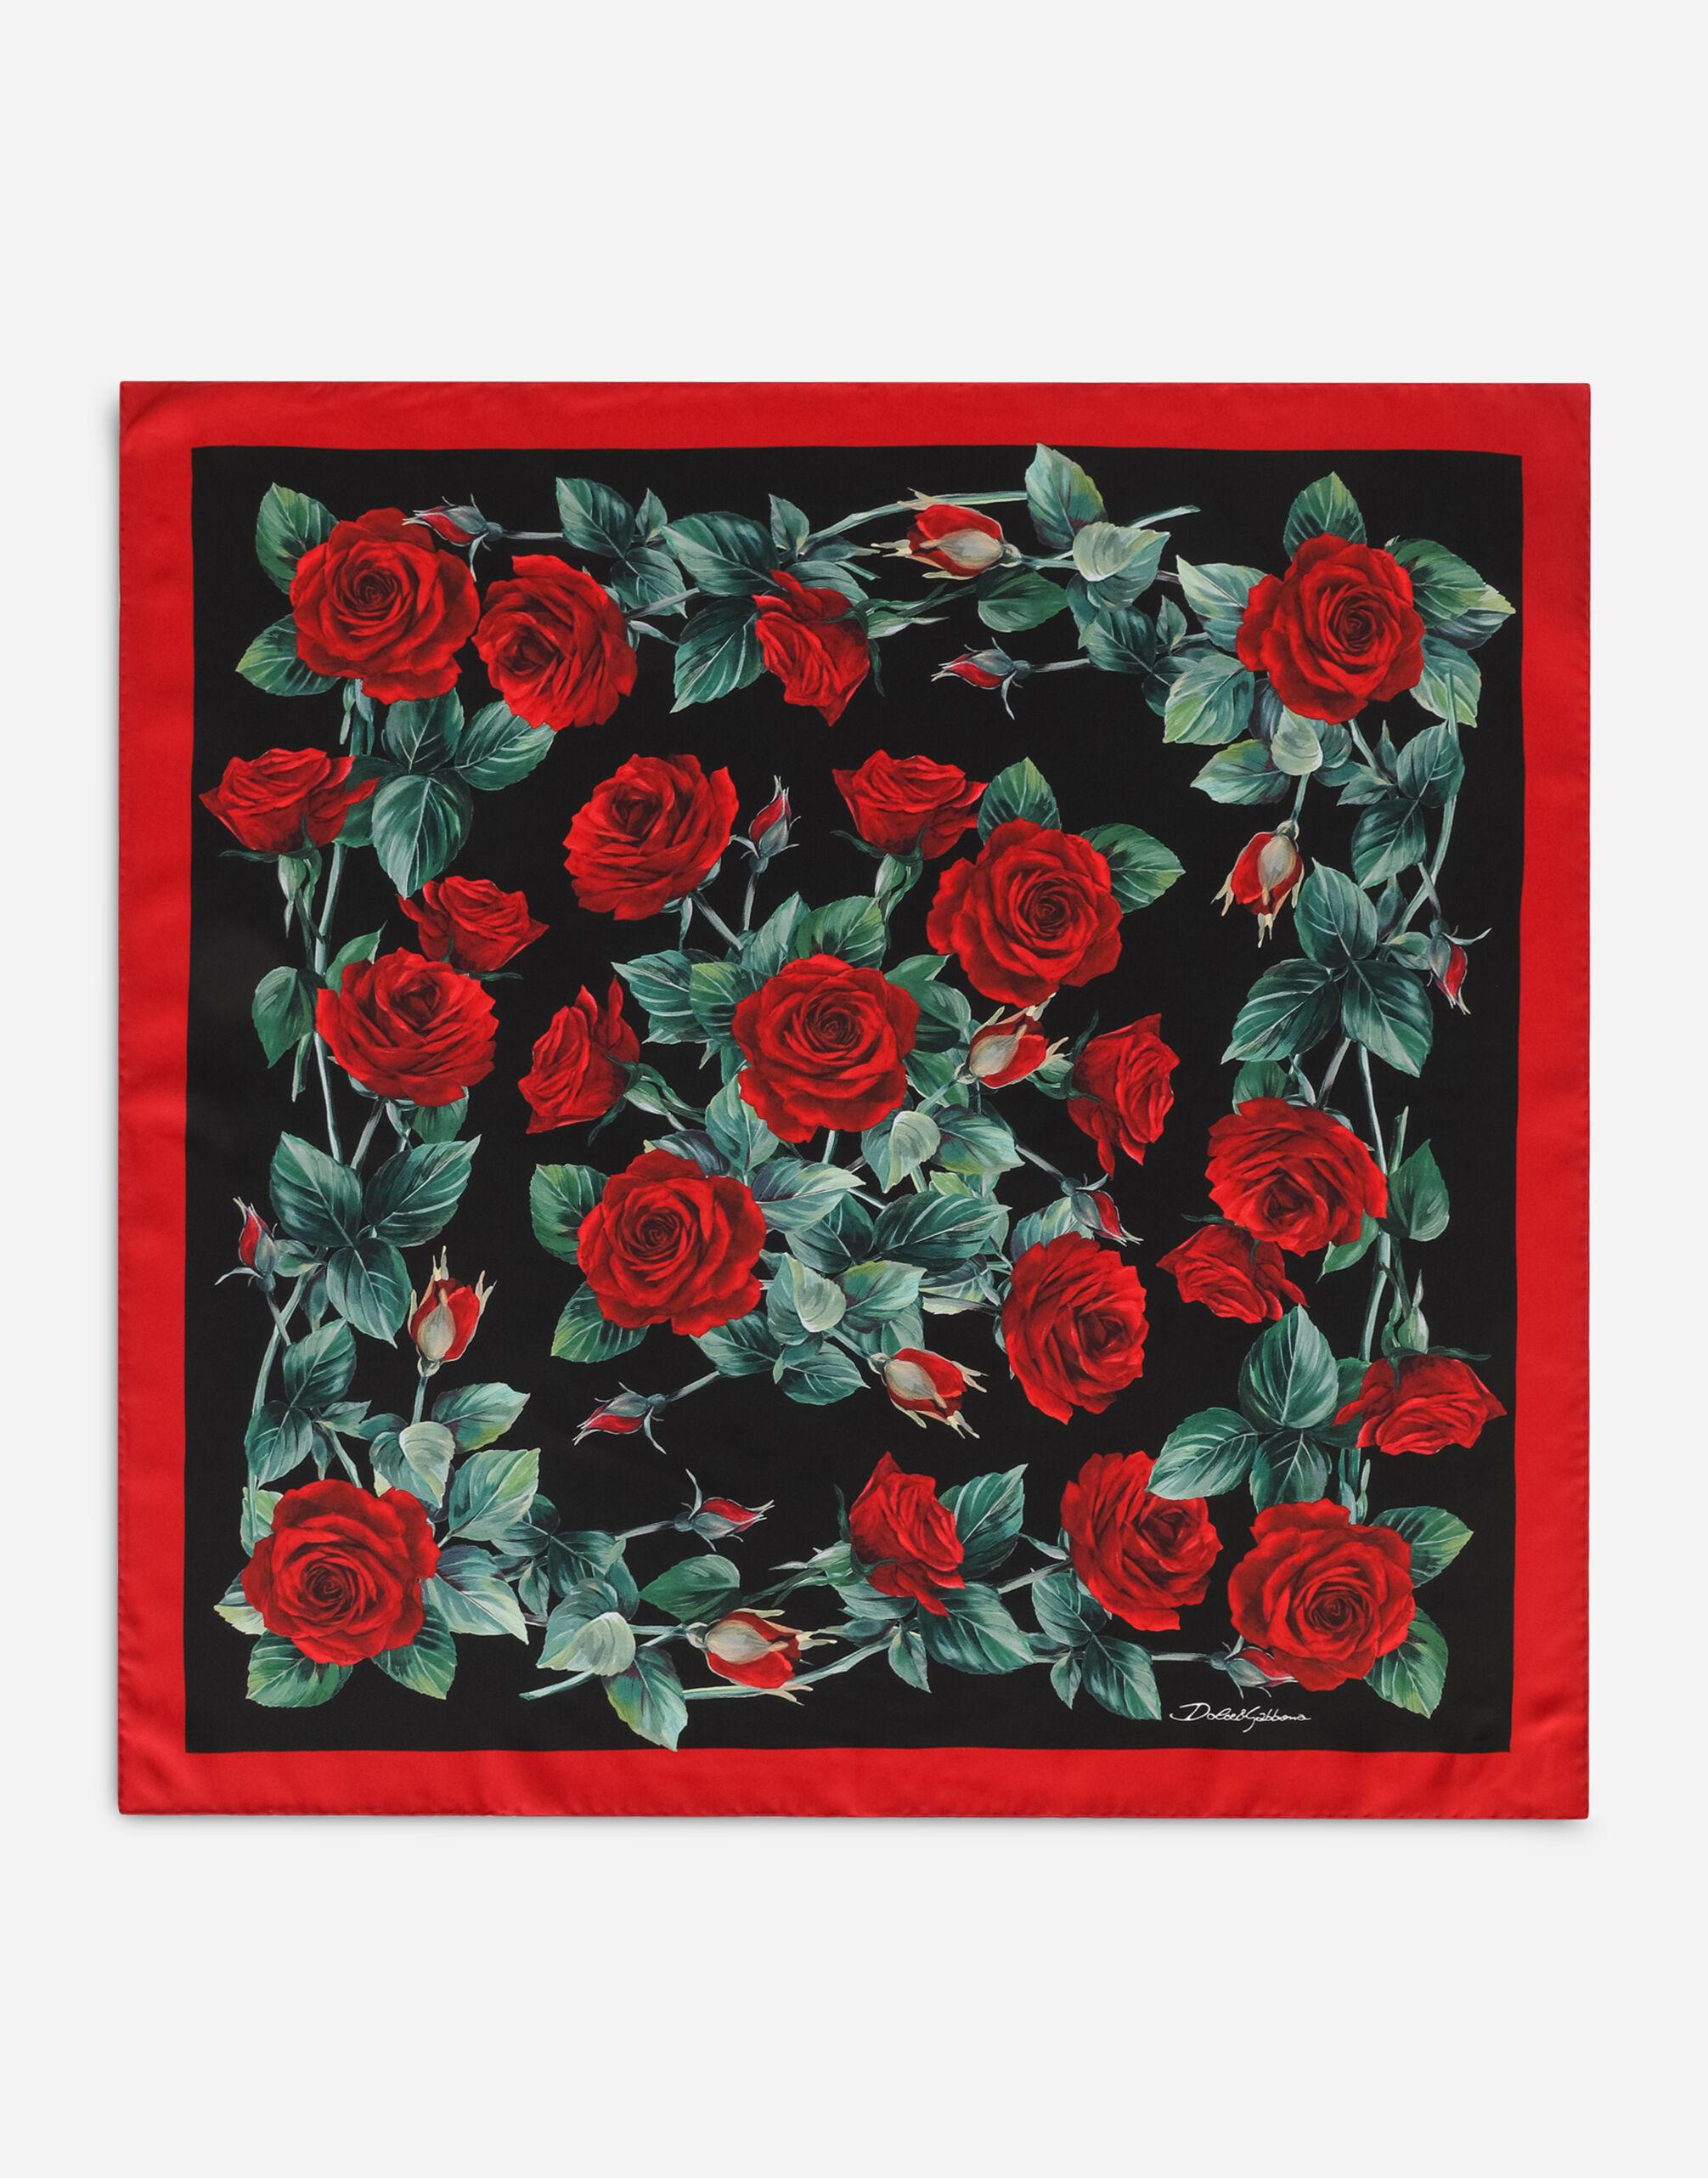 Foulard 70 x 70 in twill stampa rose